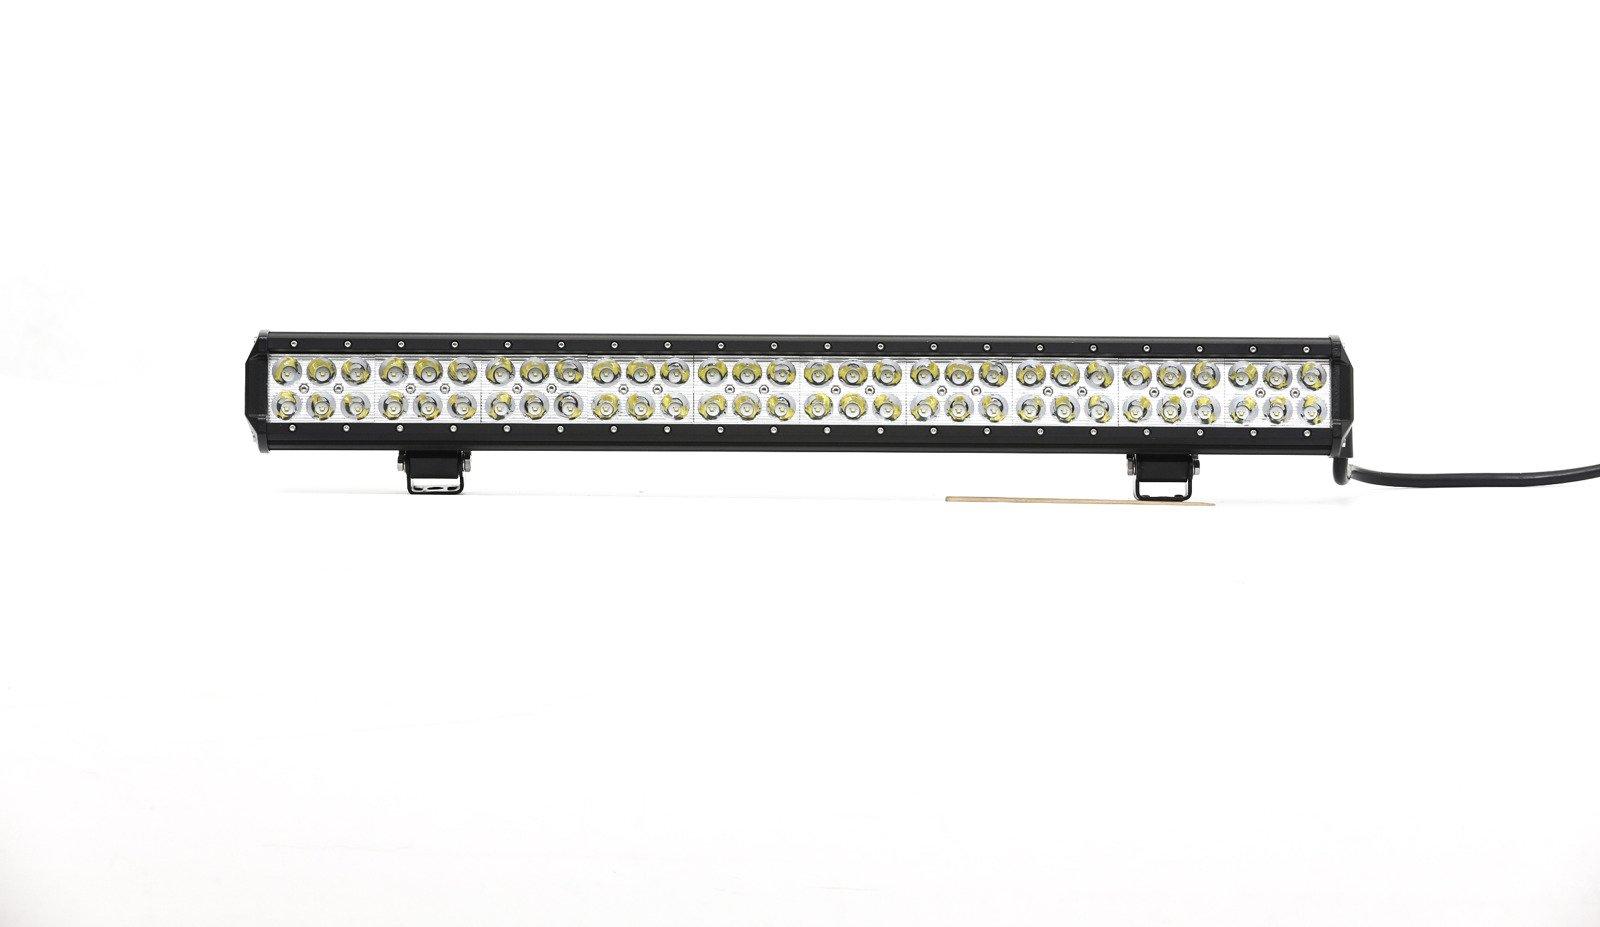 led work light bar 4x4 off road atv truck quad flood lamp 29 5 198w 66x led lb c 198w drl. Black Bedroom Furniture Sets. Home Design Ideas